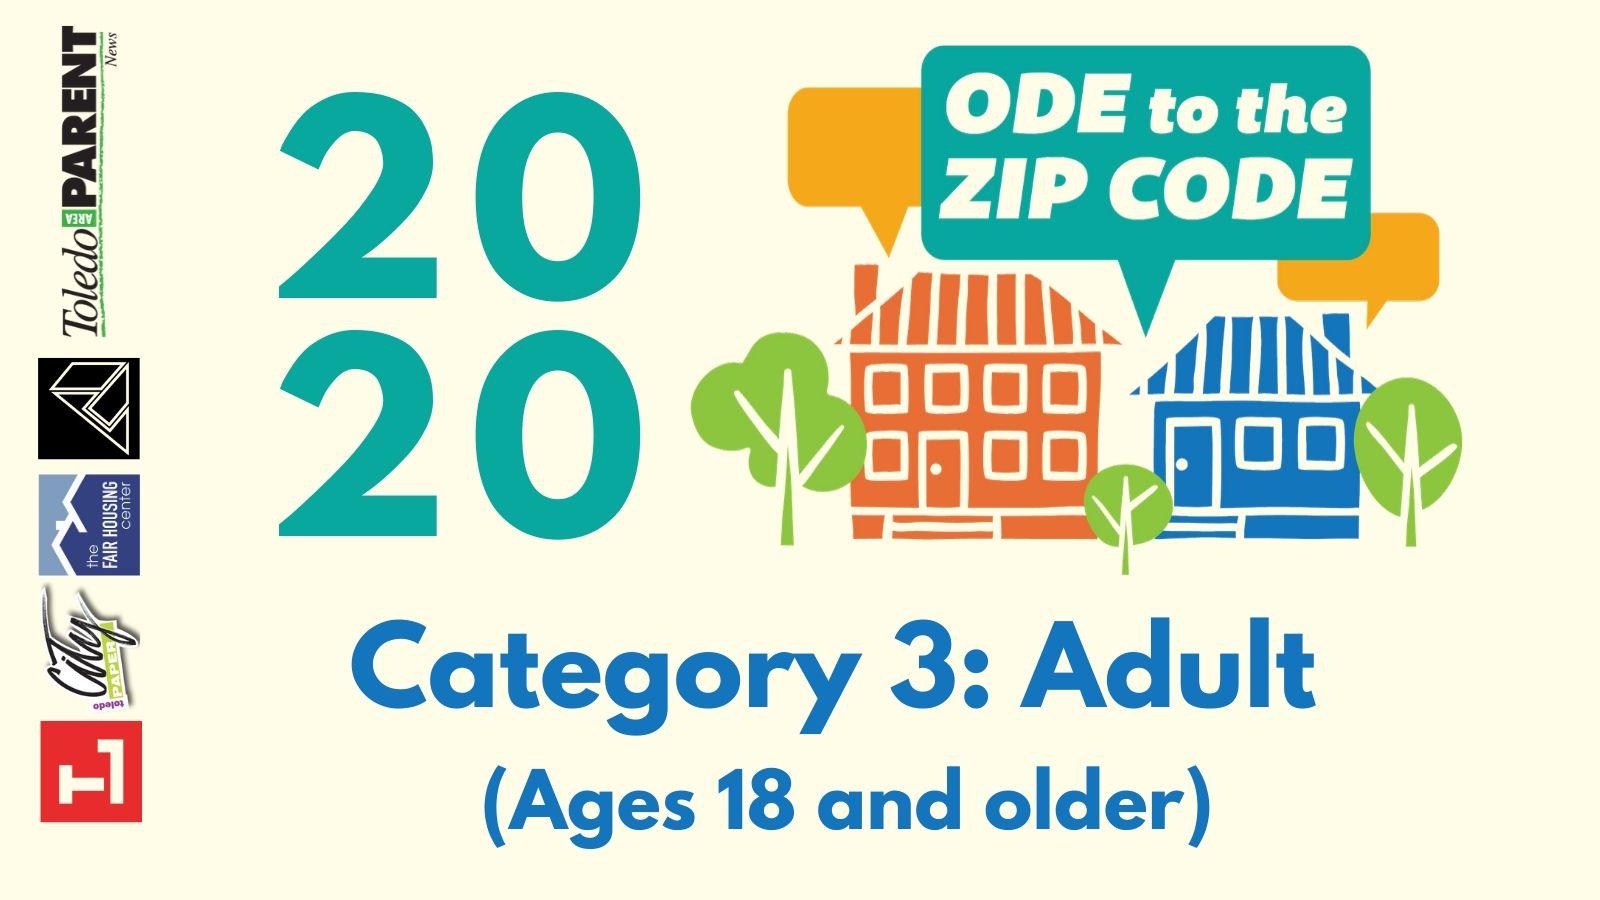 ode to the zip code - adult